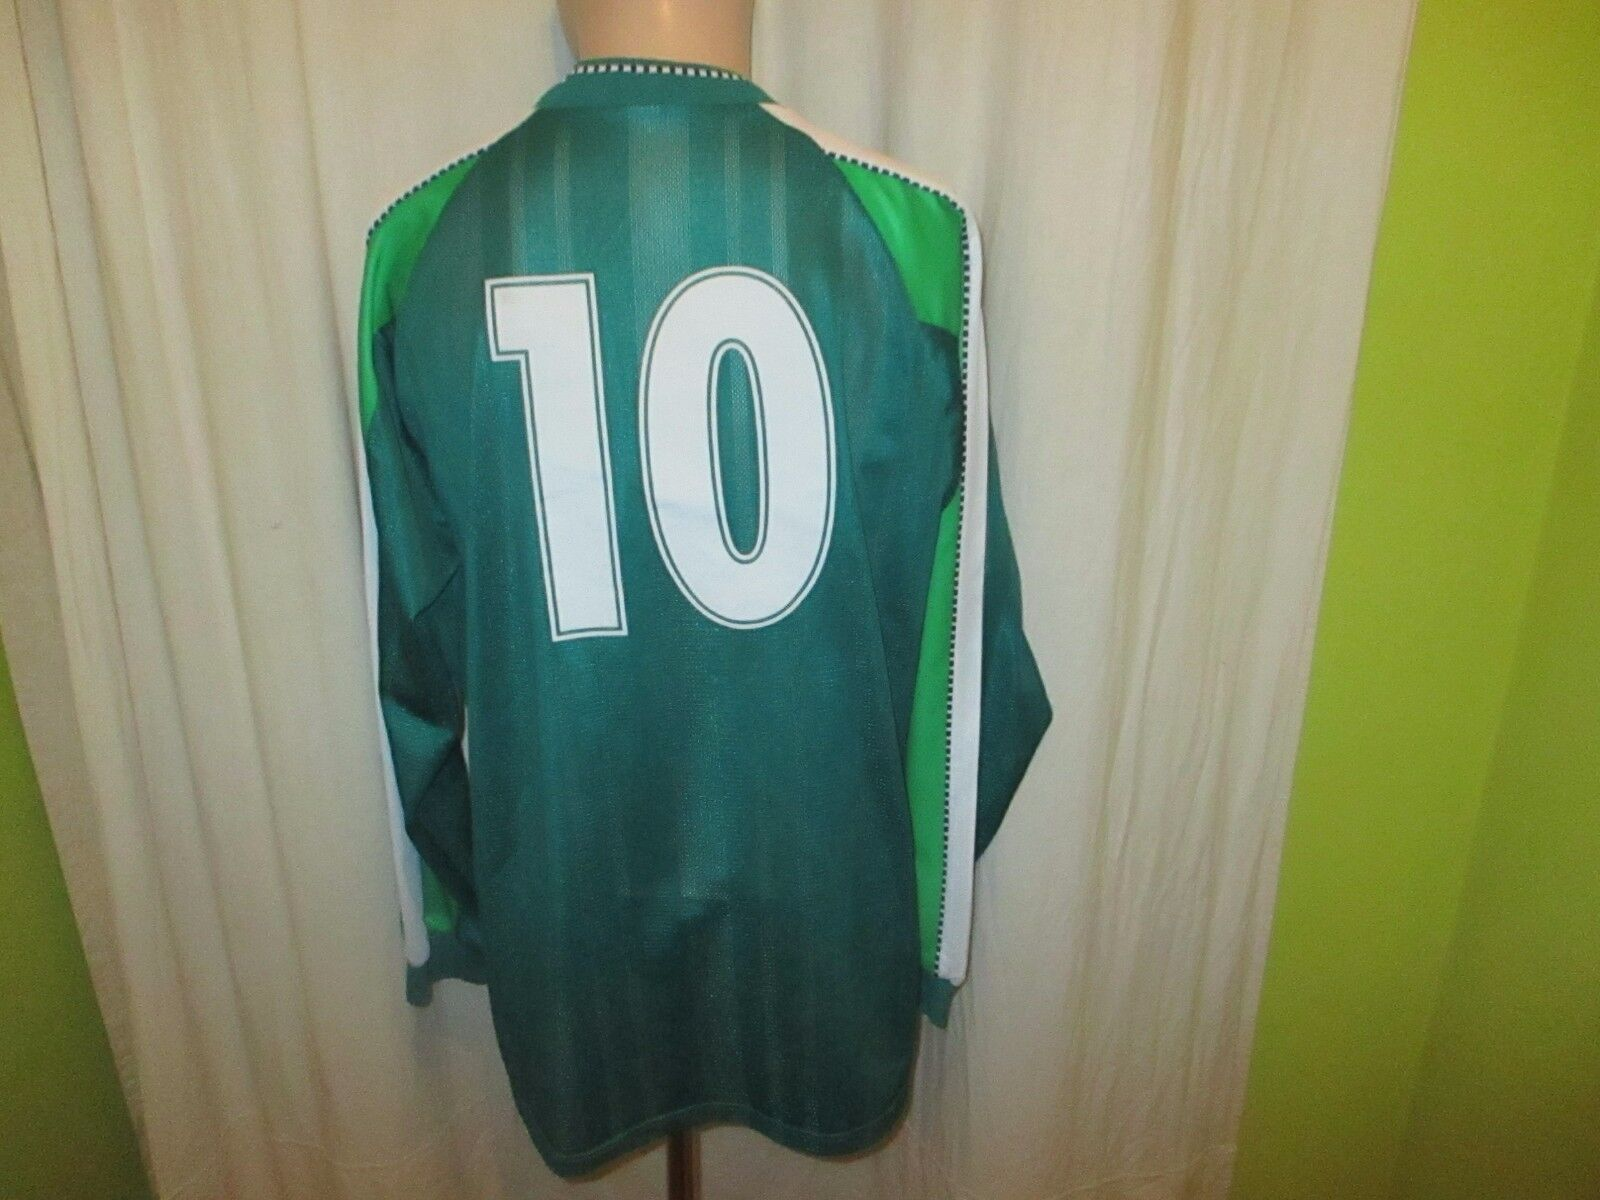 Werder Werder Werder Bremen Original Puma Langarm Trikot 1998 99  o.tel.o  + Nr.10 Gr.L TOP 8a9da2